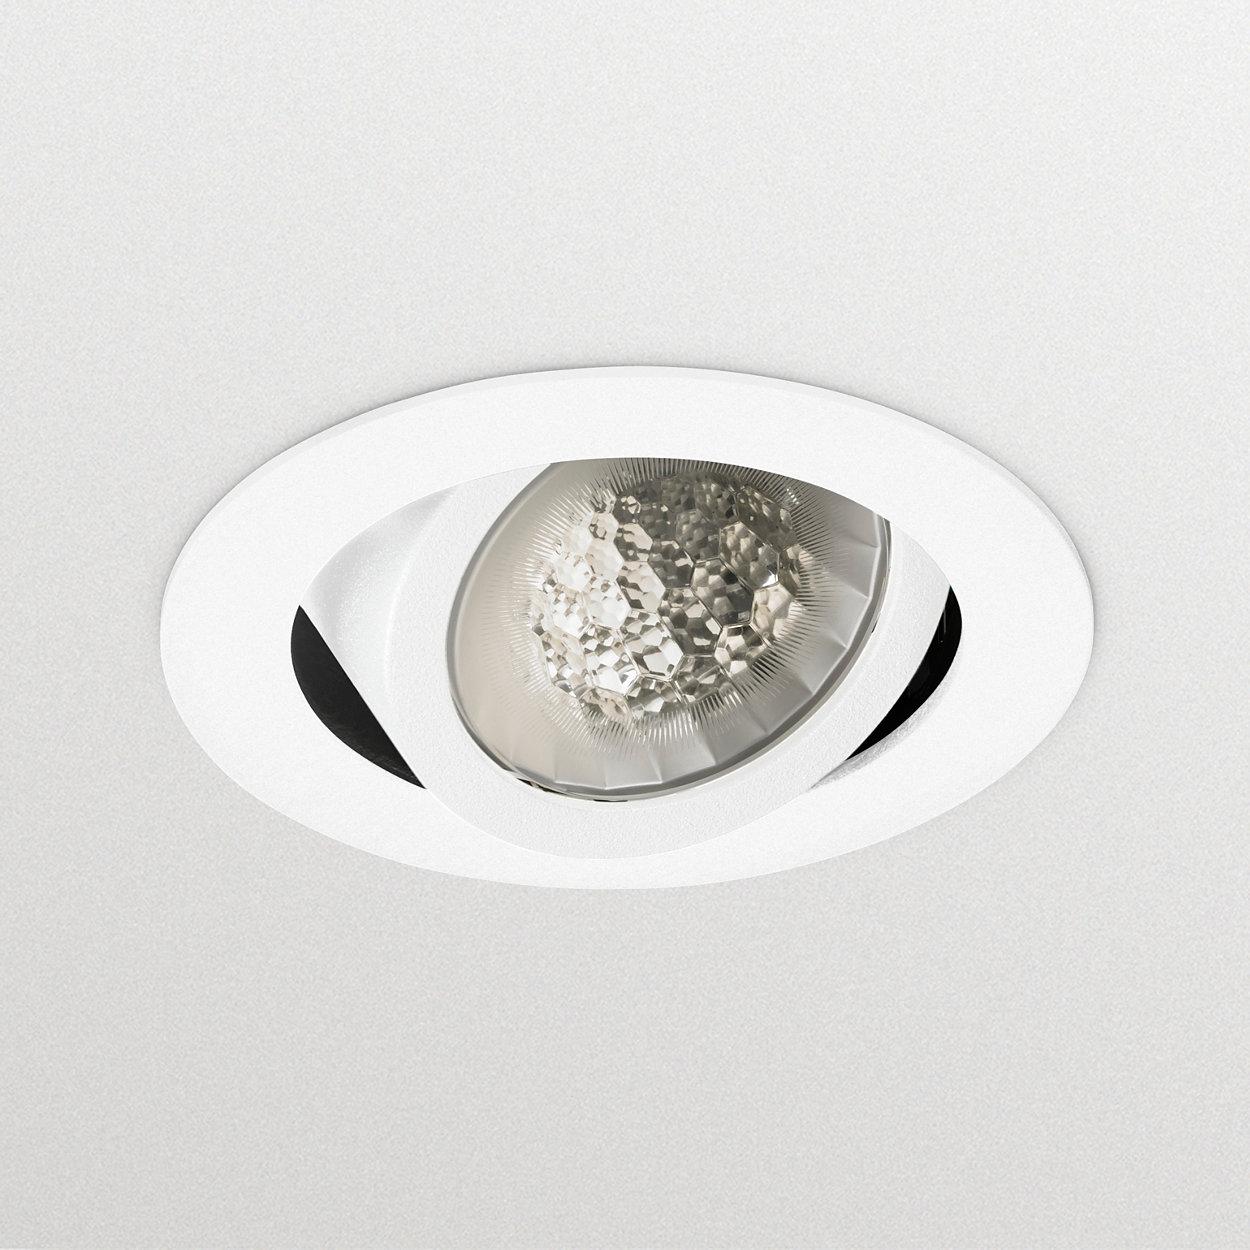 LuxSpace Accent - det mest energieffektive sortiment til butikker